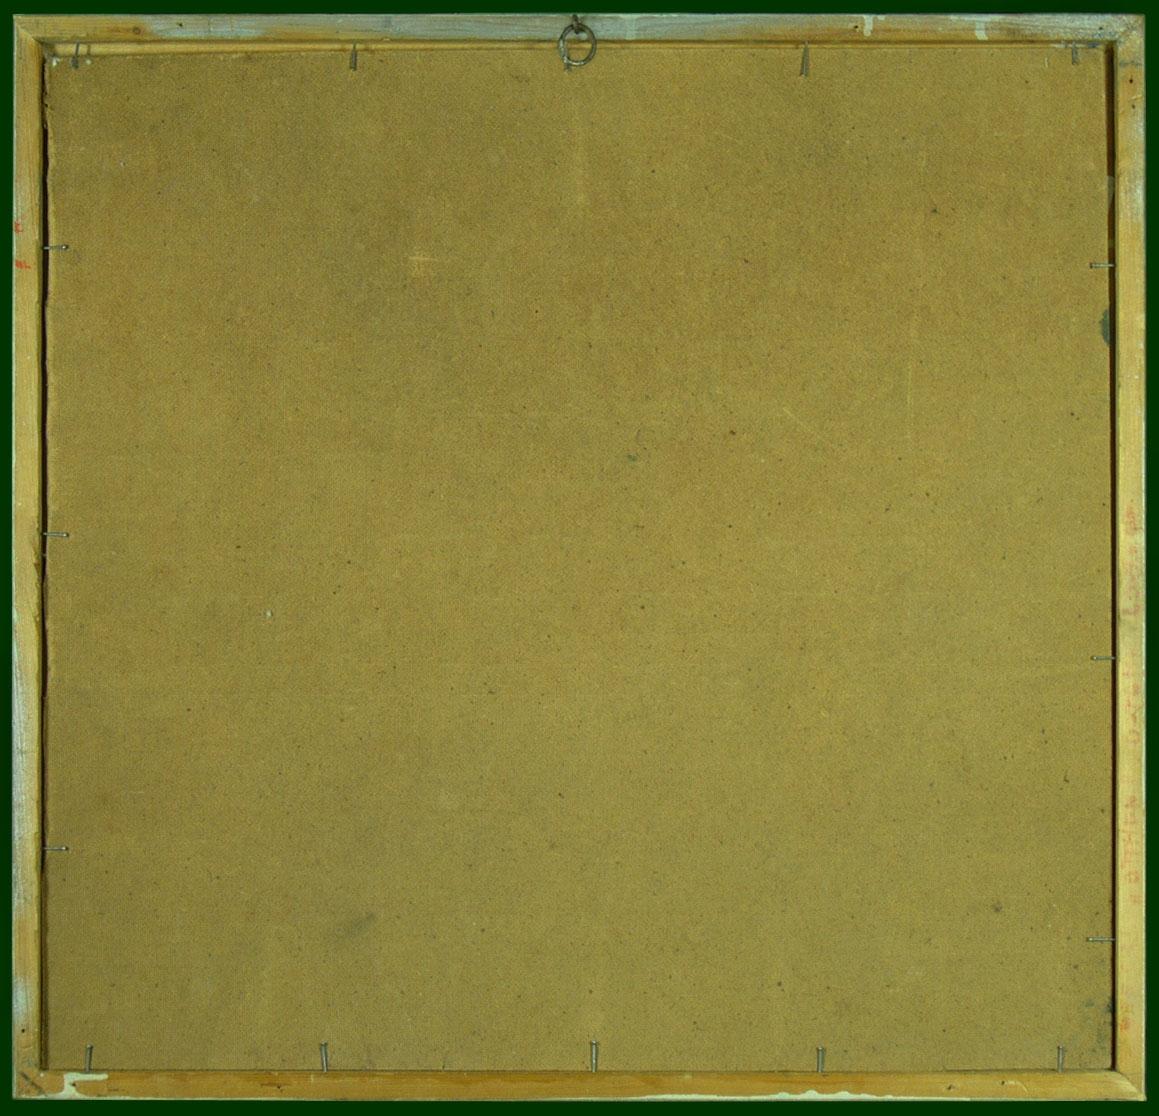 65-5hat.JPG (1159×1116)